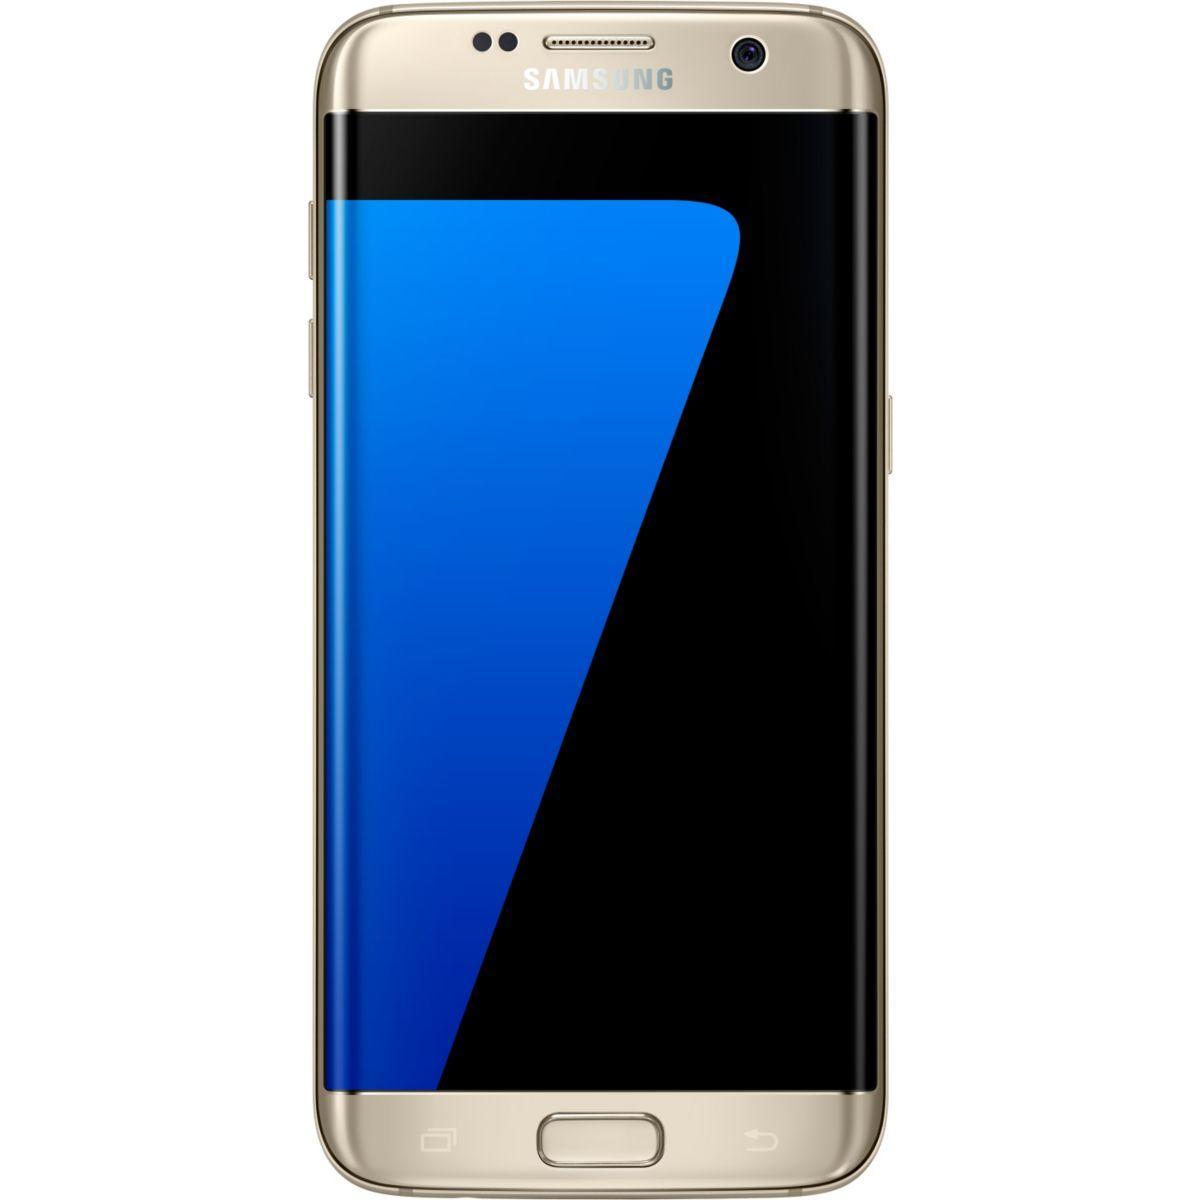 Pack promo smartphone samsung galaxy s7 edge or 32 go + etui samsung s view cover galaxy s7 edge gold - soldes et bonnes affaires à prix imbattables